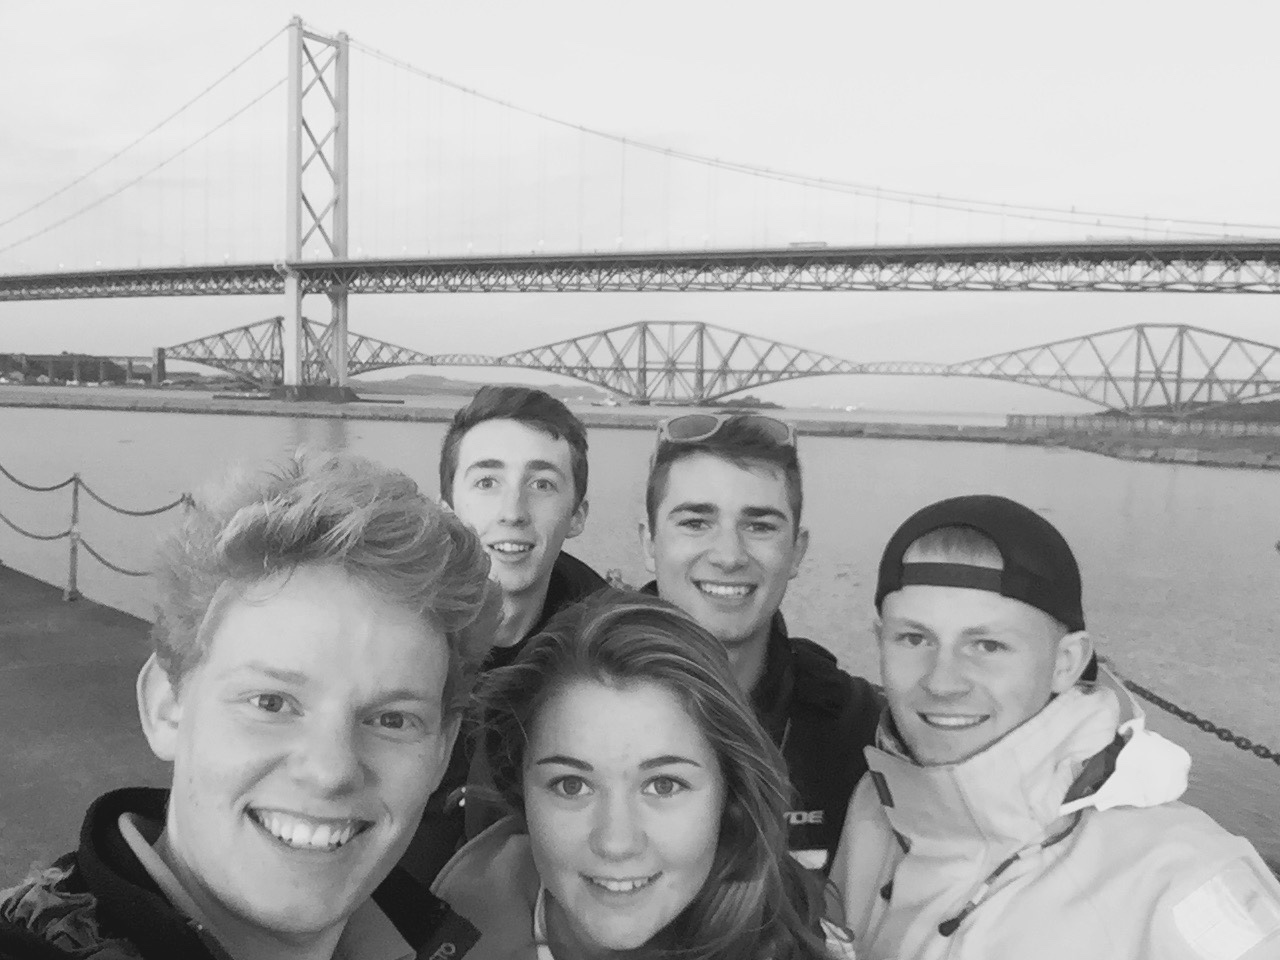 yachting team 1